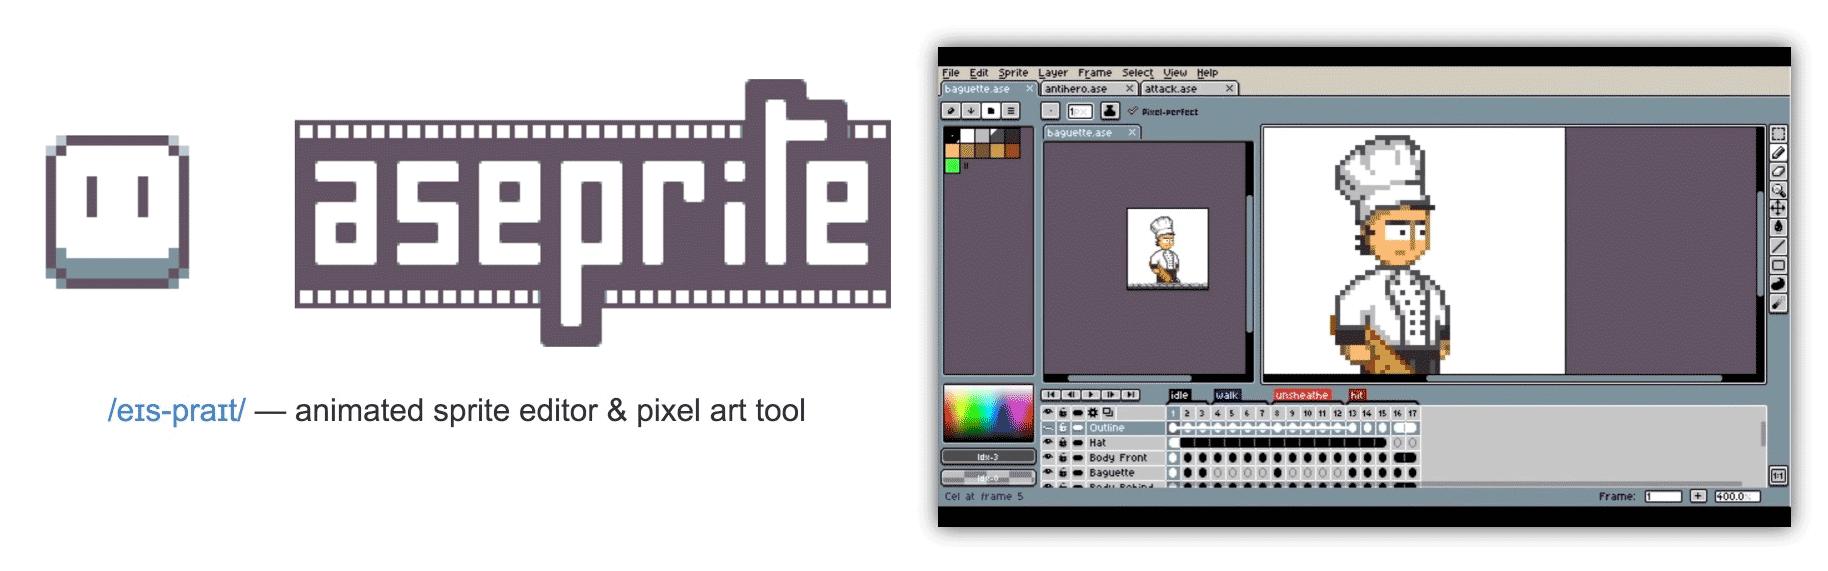 Aseprite - Animated sprite editor & pixel art tool - @mwender